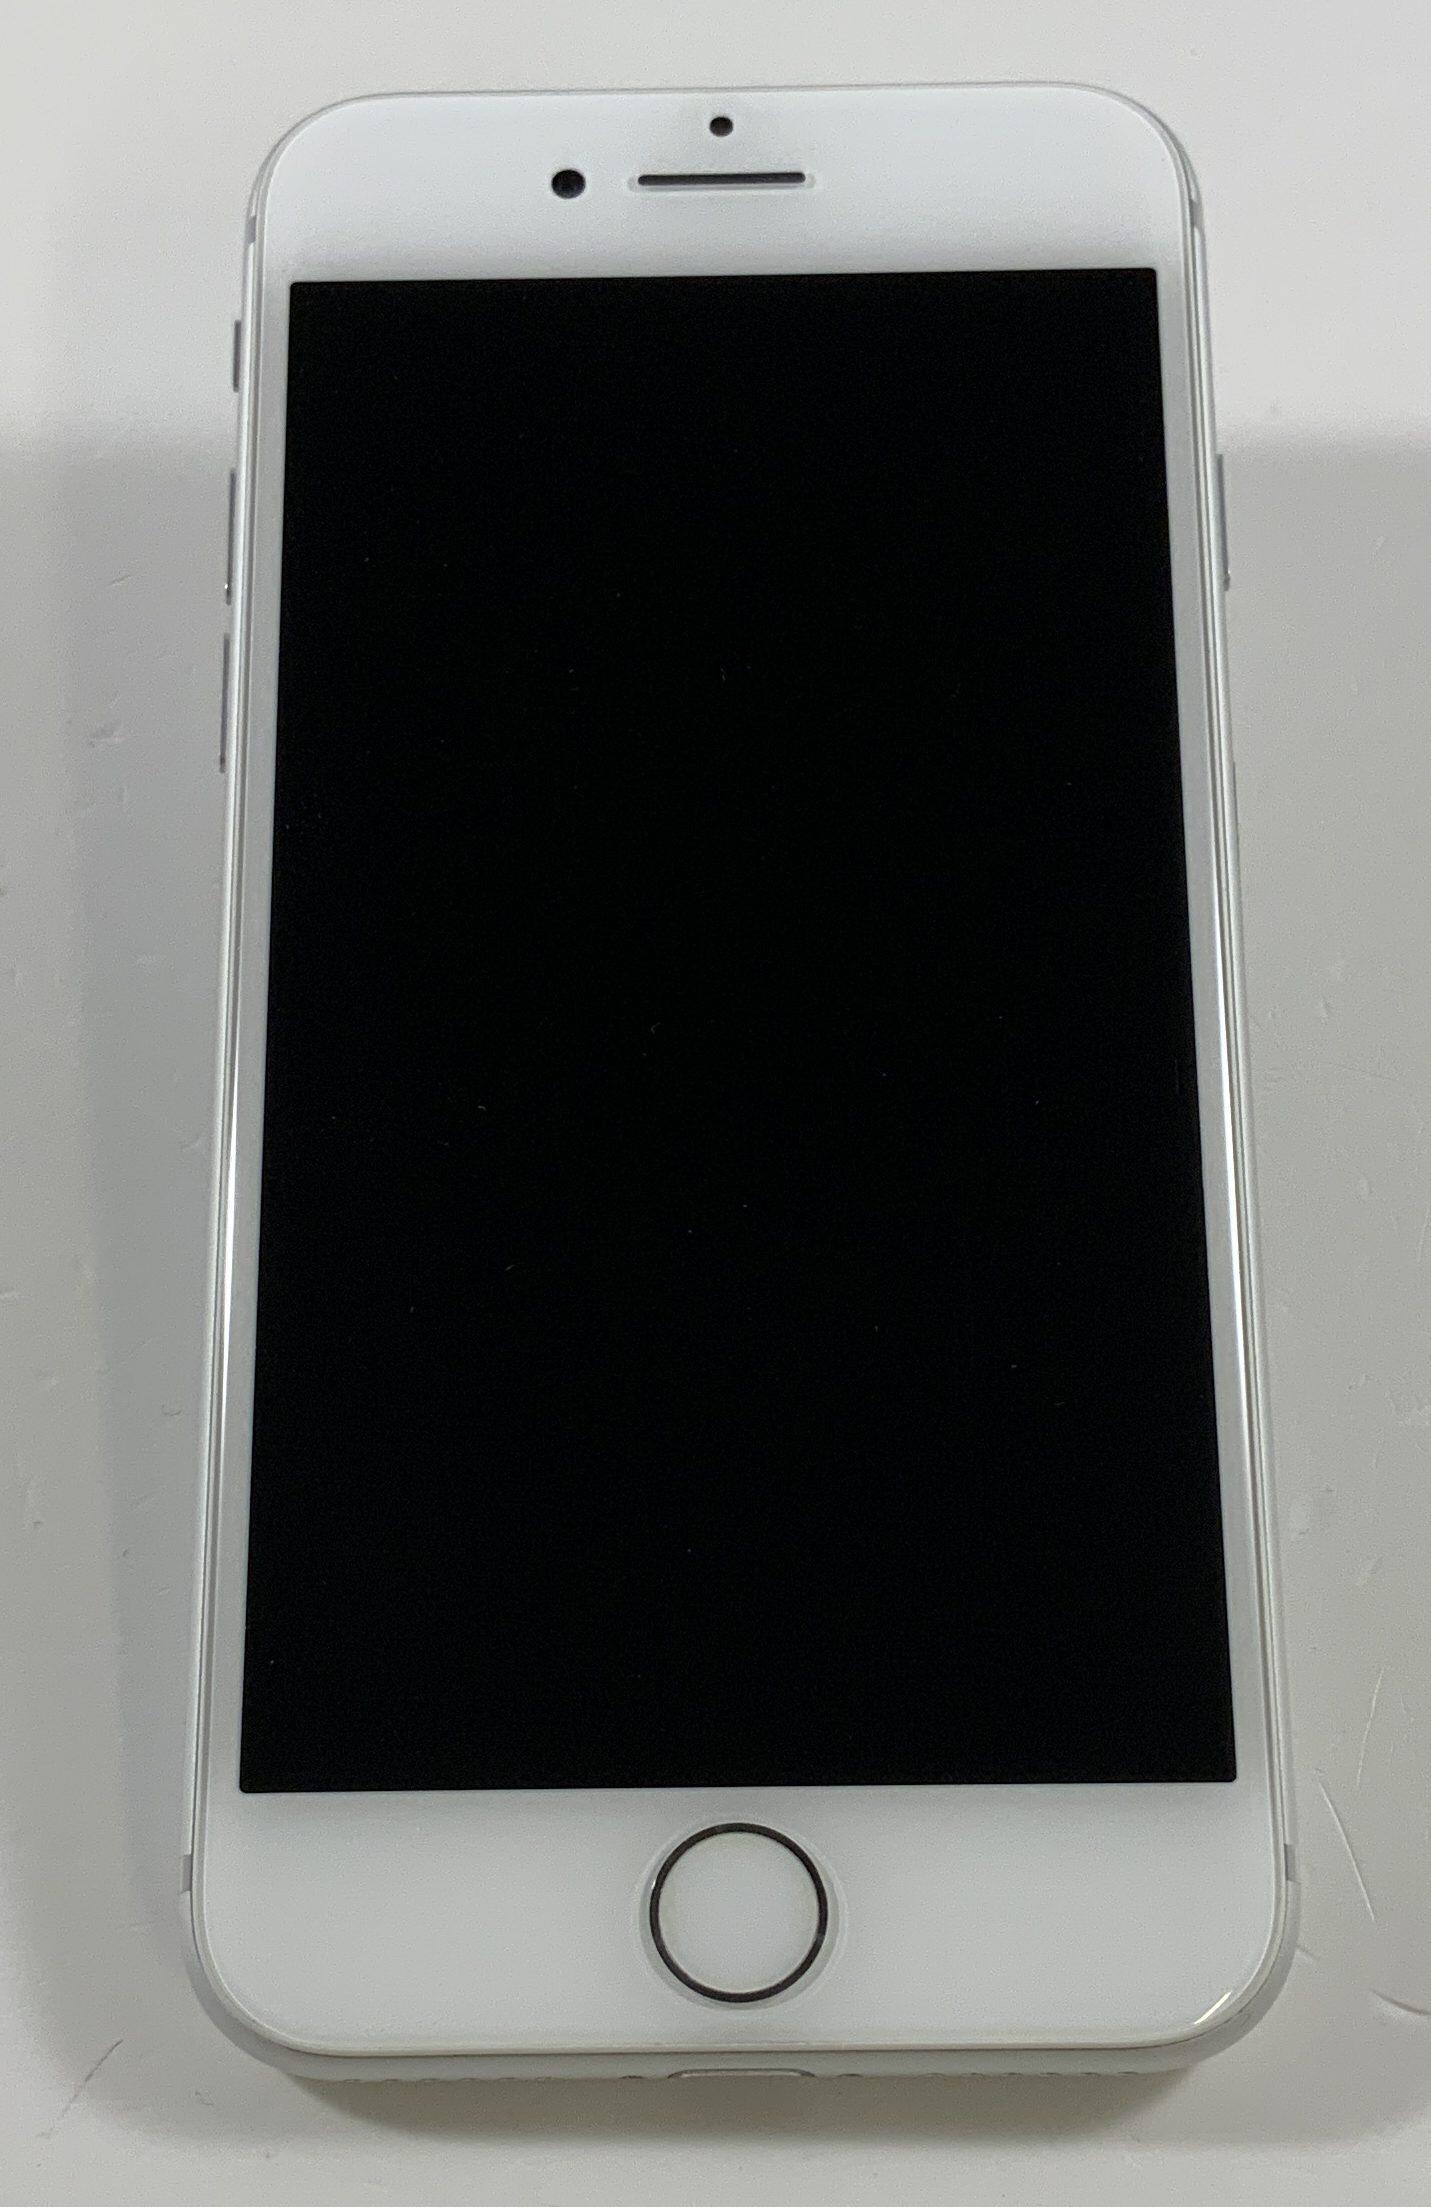 iPhone 7 32GB, 32GB, Silver, immagine 1